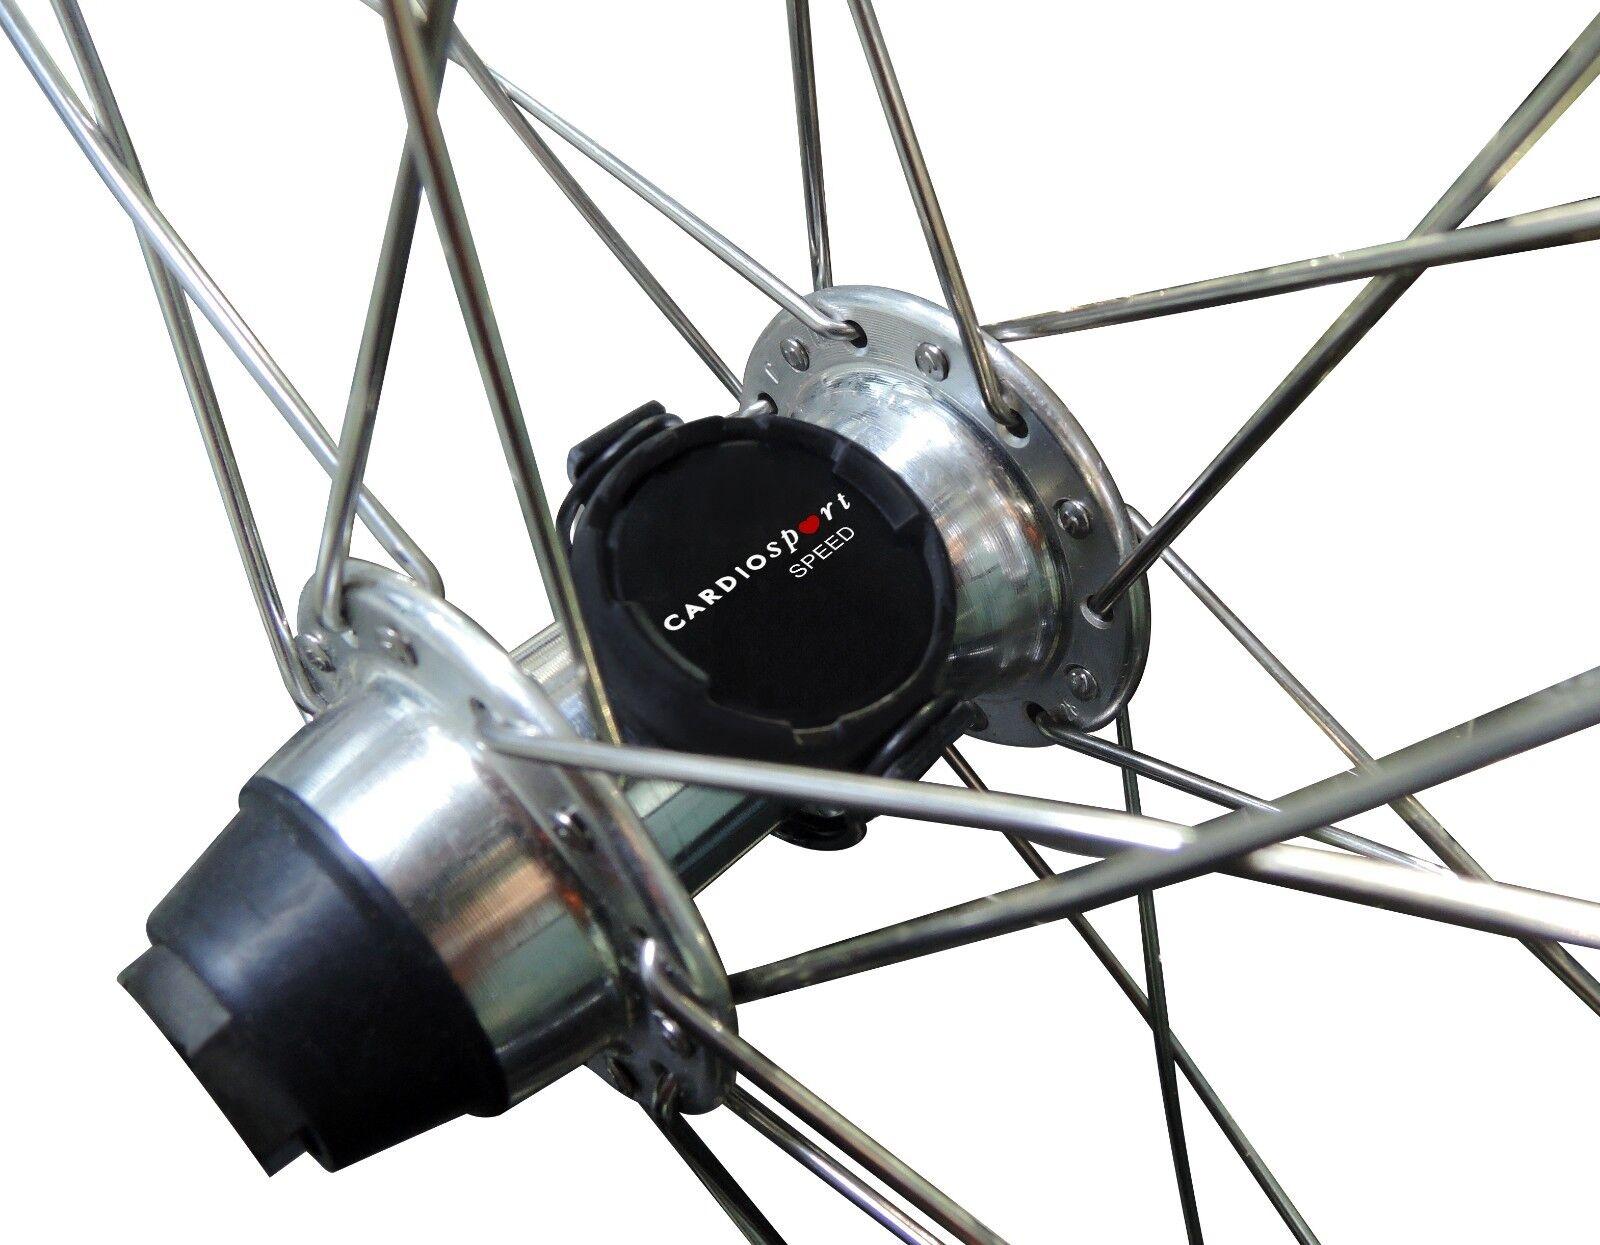 Cardiosport SOLO Bluetooth/ANT + Vélo Capteur de de de vitesse, pour iOS/Android & Garmin 48afc5